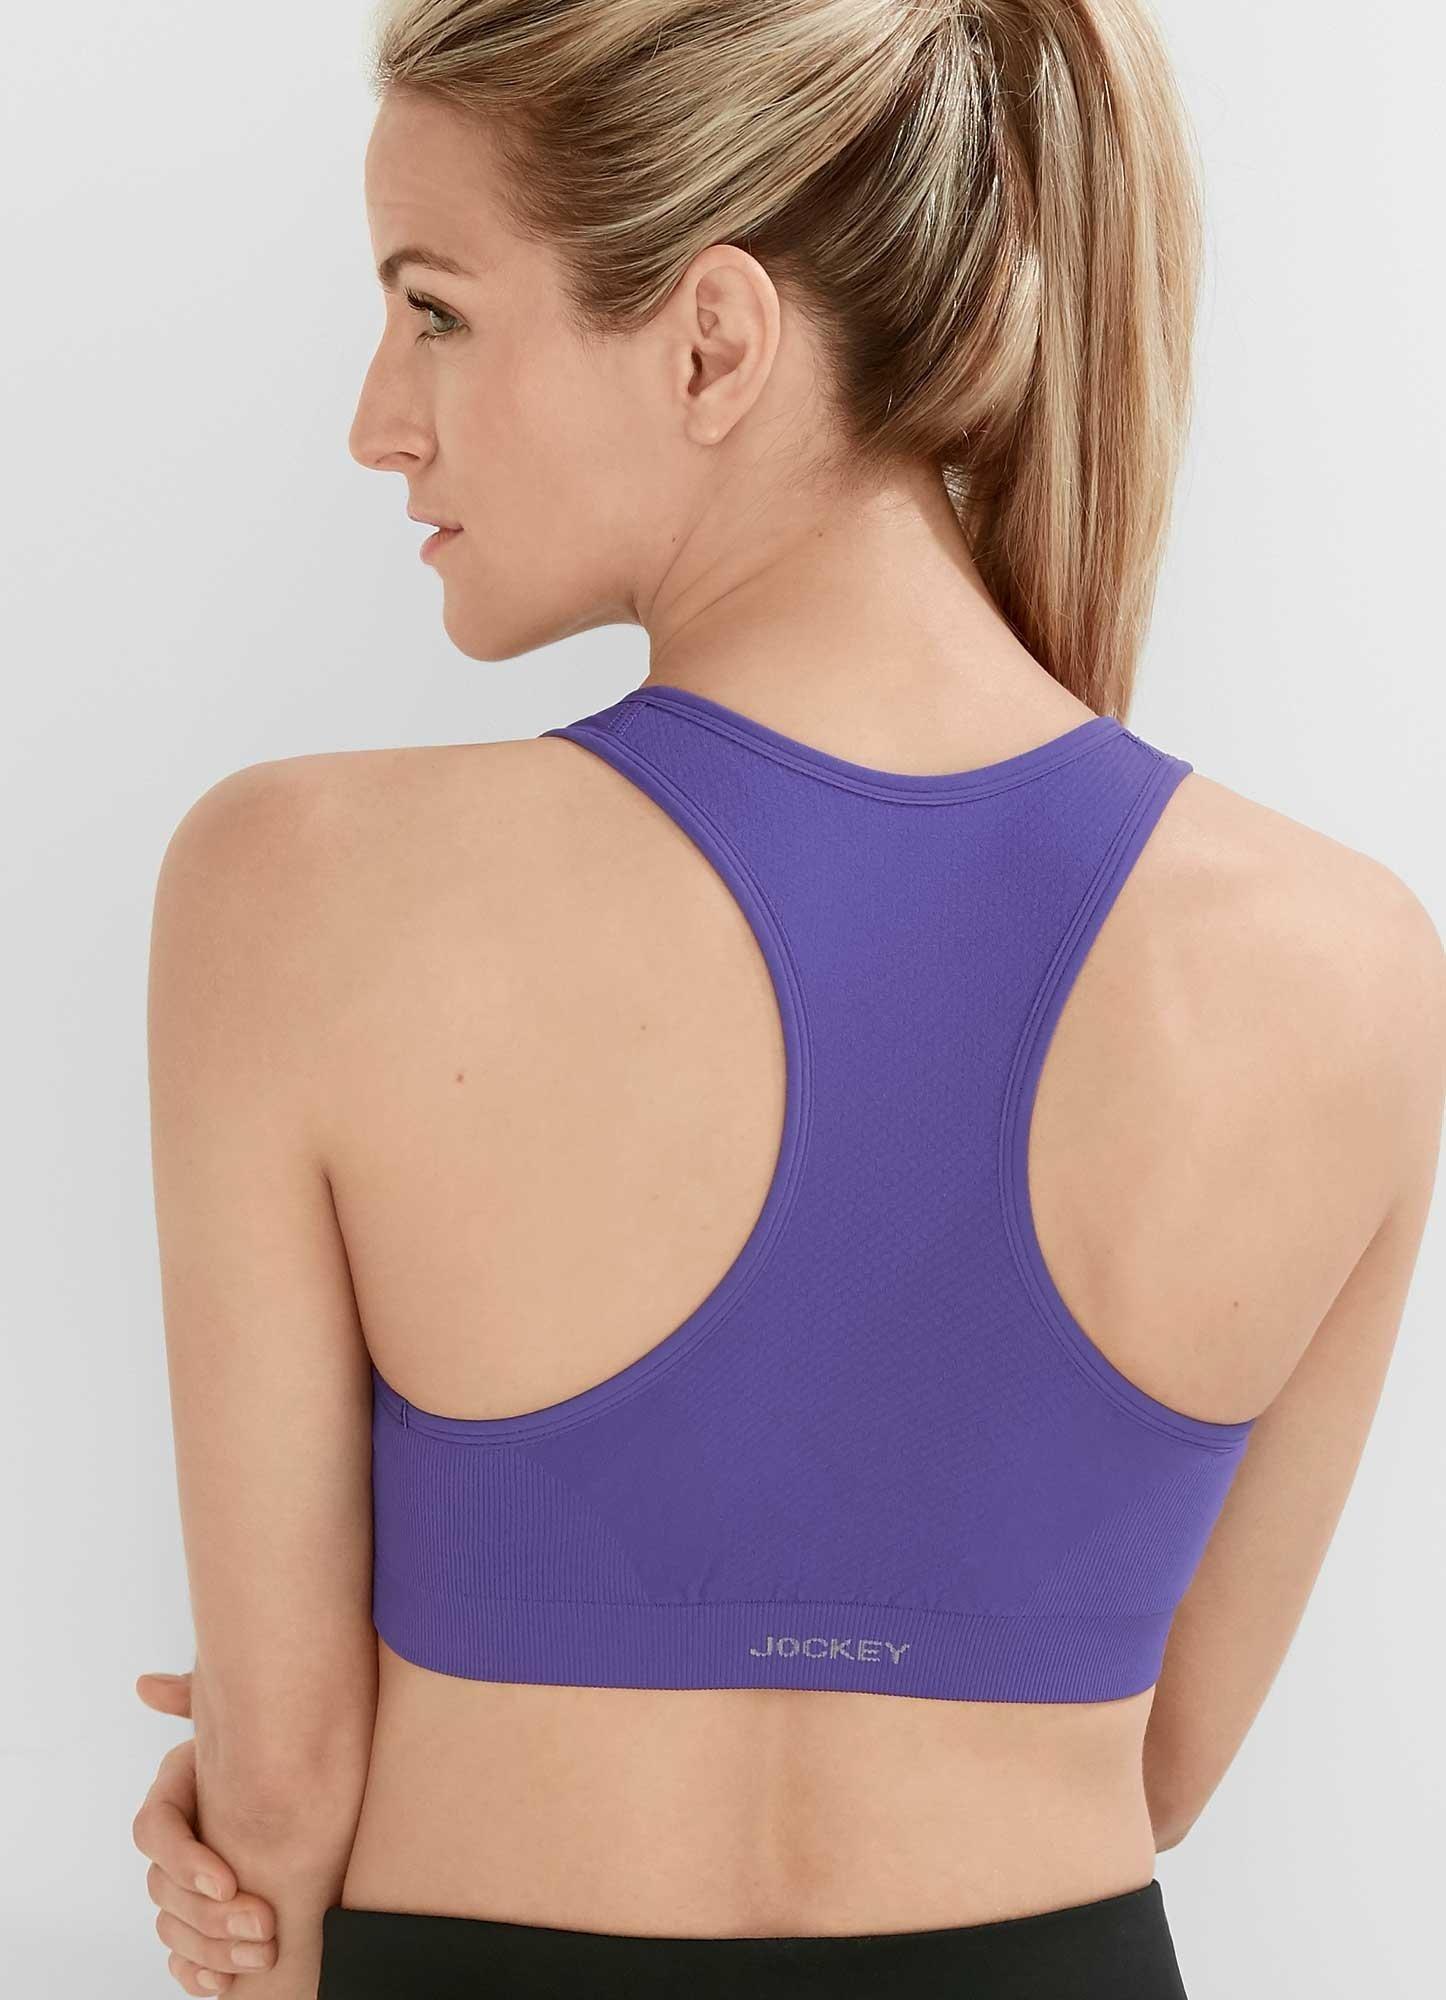 Jockey Women's Zip Front Seam Free Bra, Purple Afterglow, Small by Jockey (Image #5)